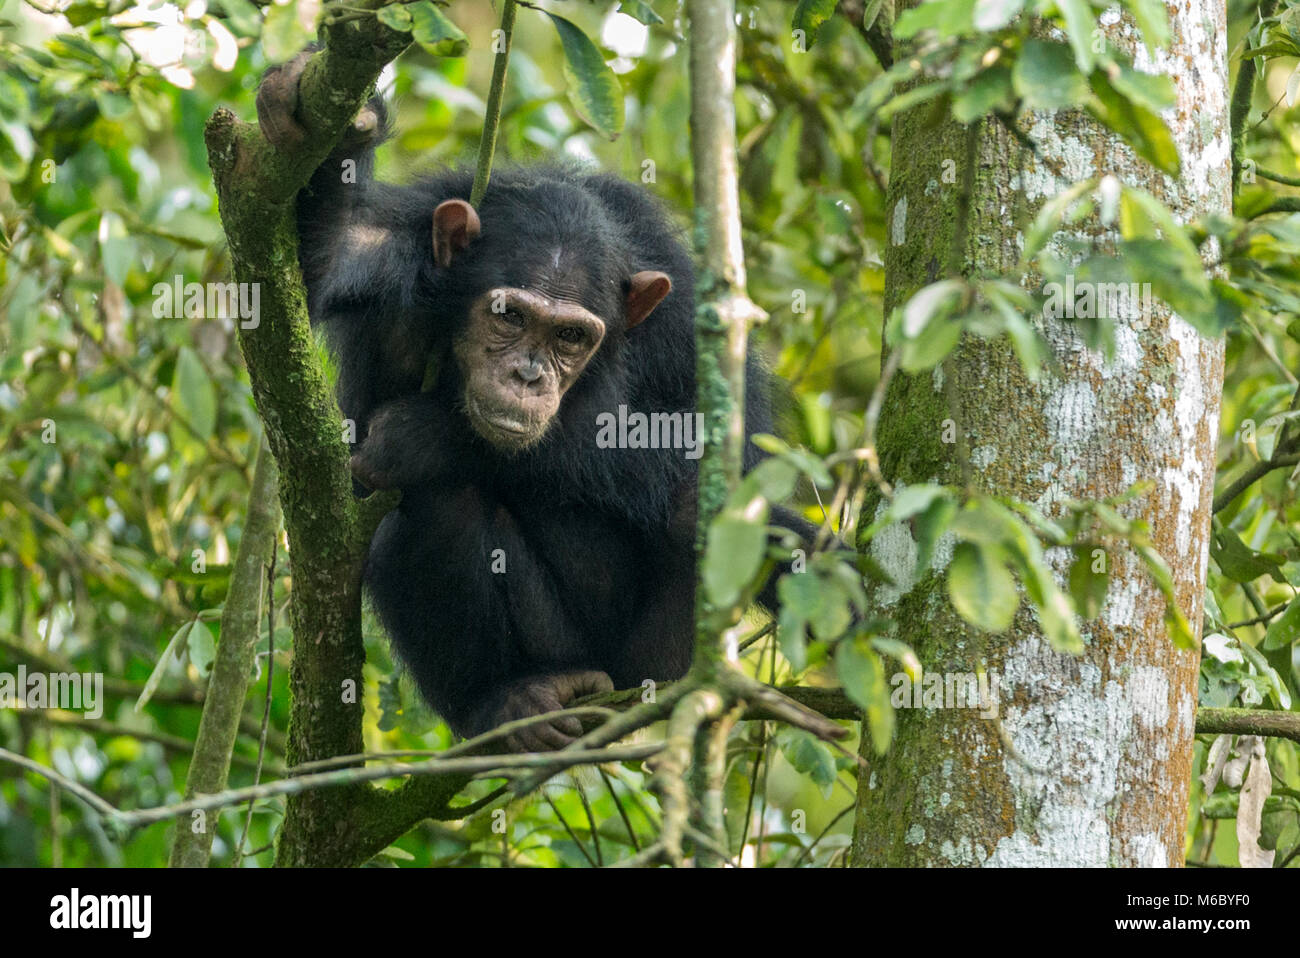 Chimpanzee in tree Kimbale Forest National Park Uganda Africa - Stock Image